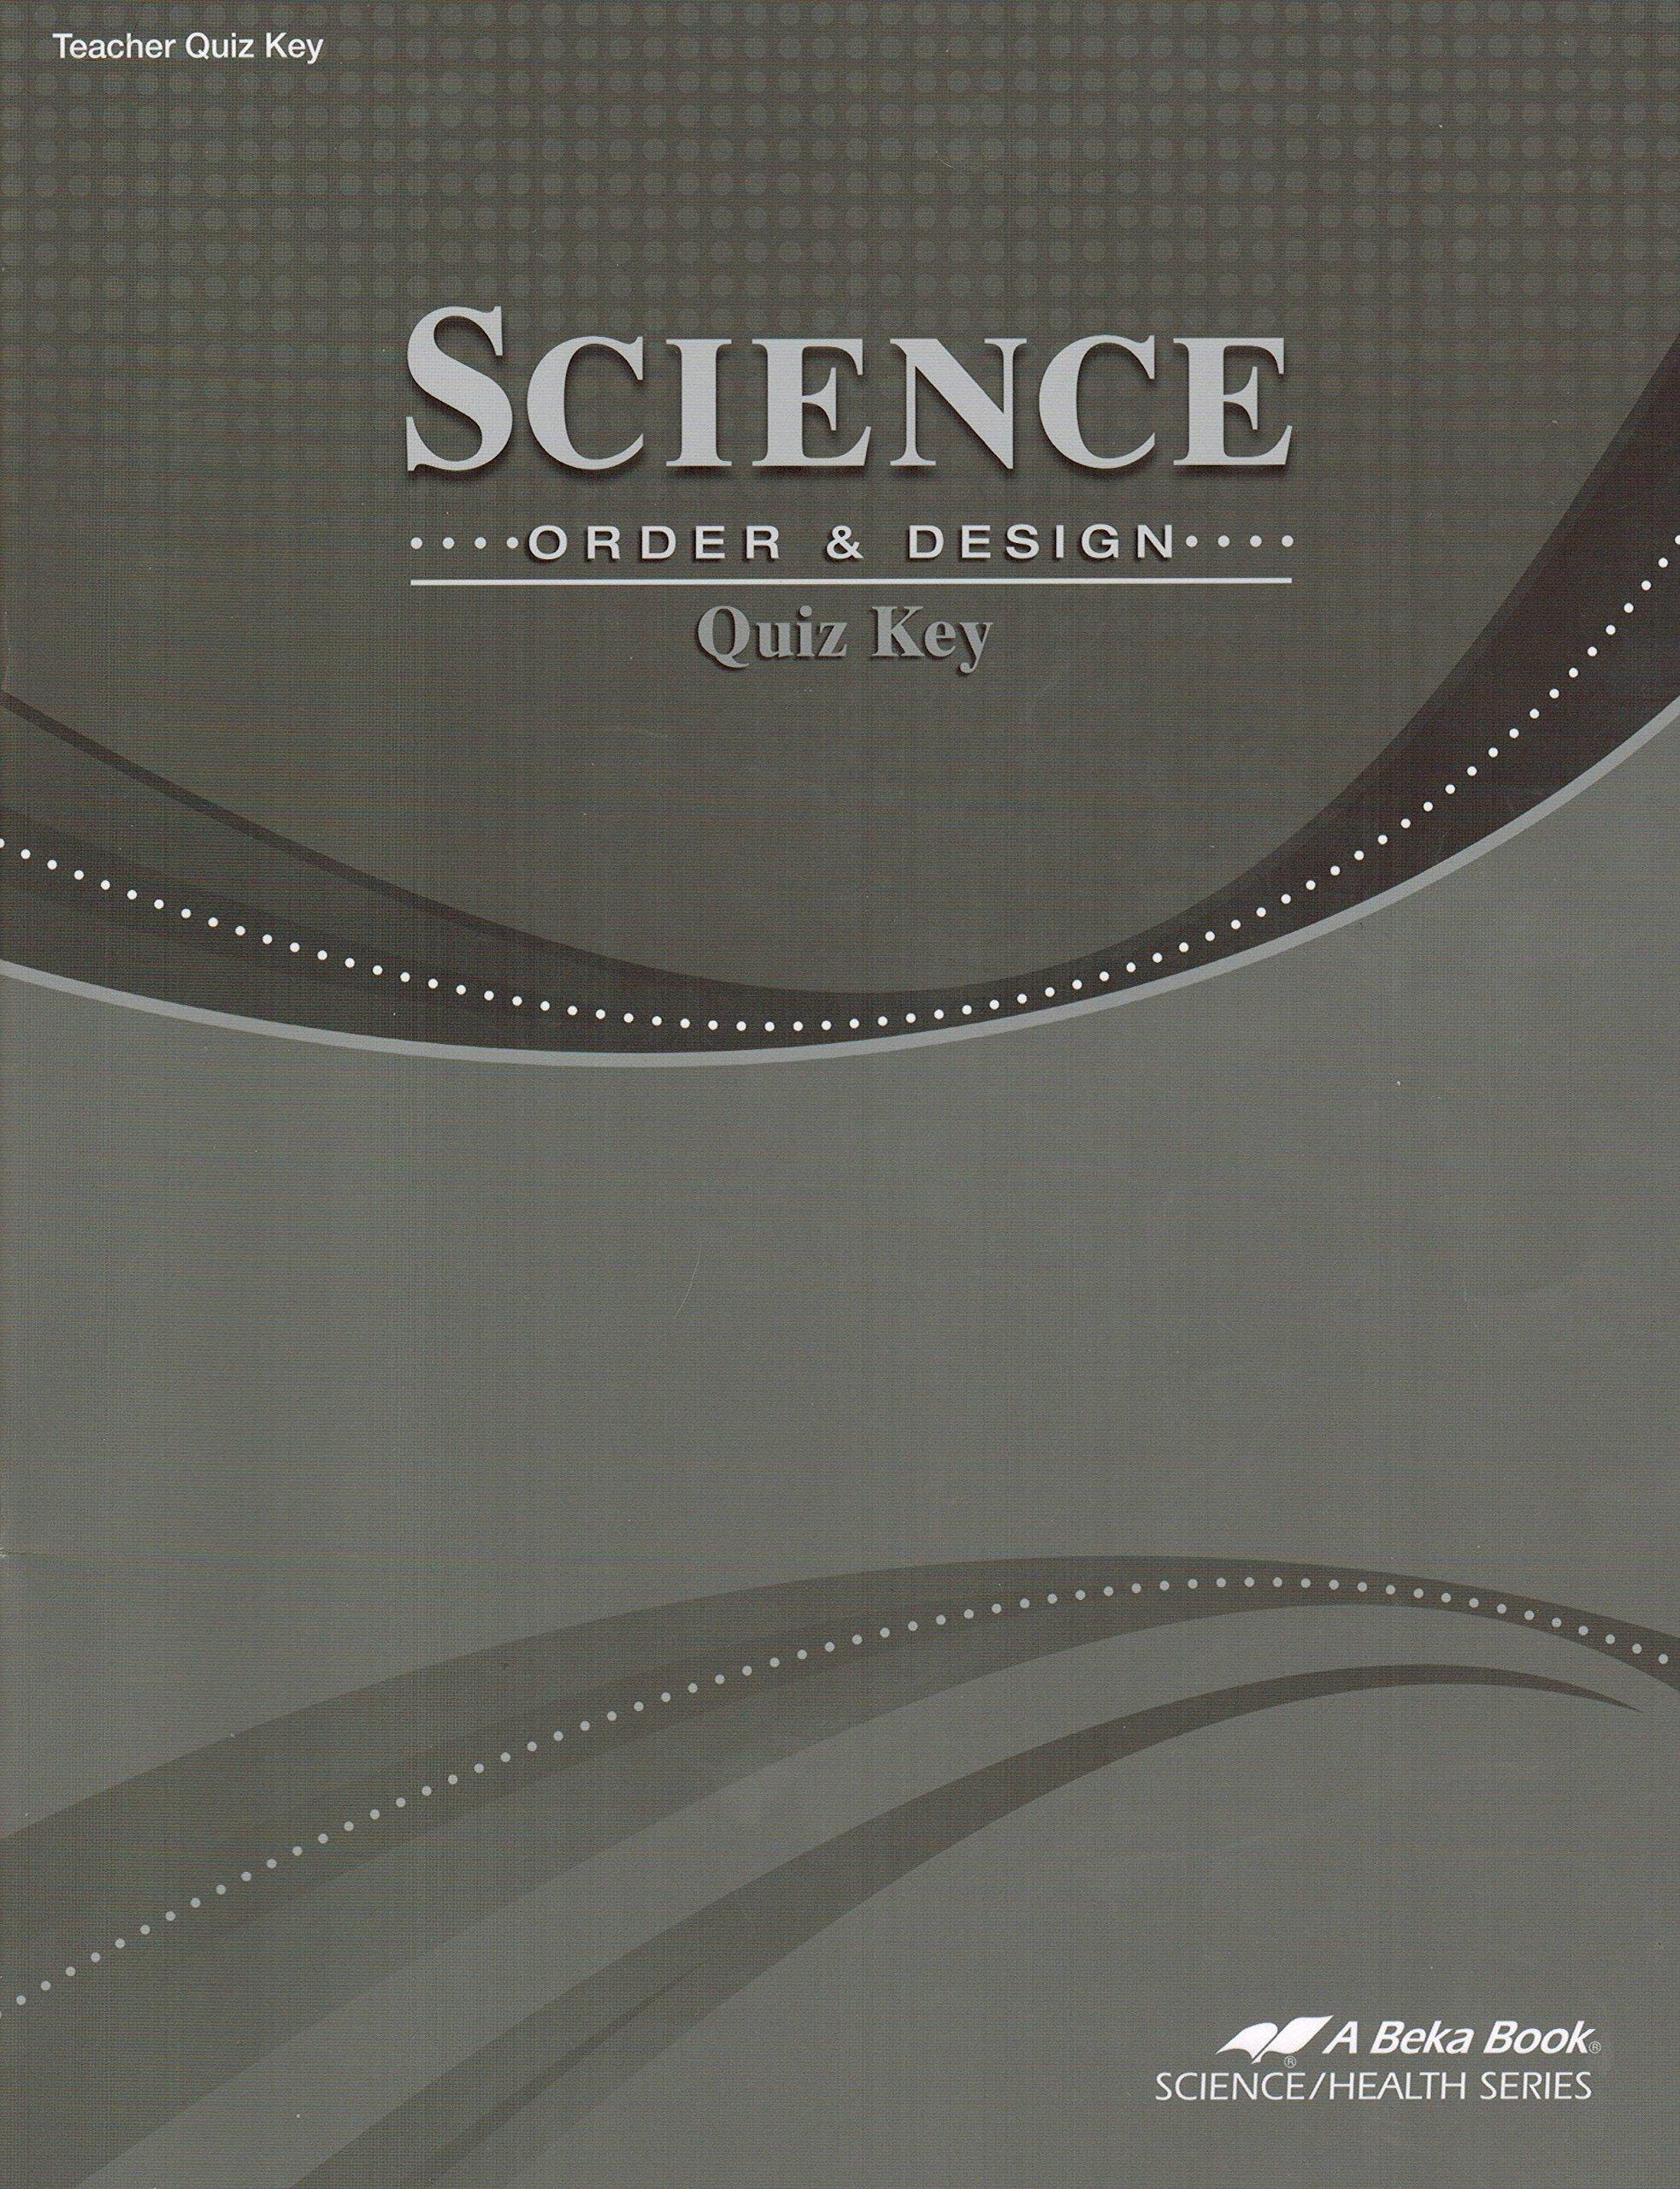 Download Science Order and Design Quiz Key- Grade 7, A Beka Book, Code 11557603 ebook